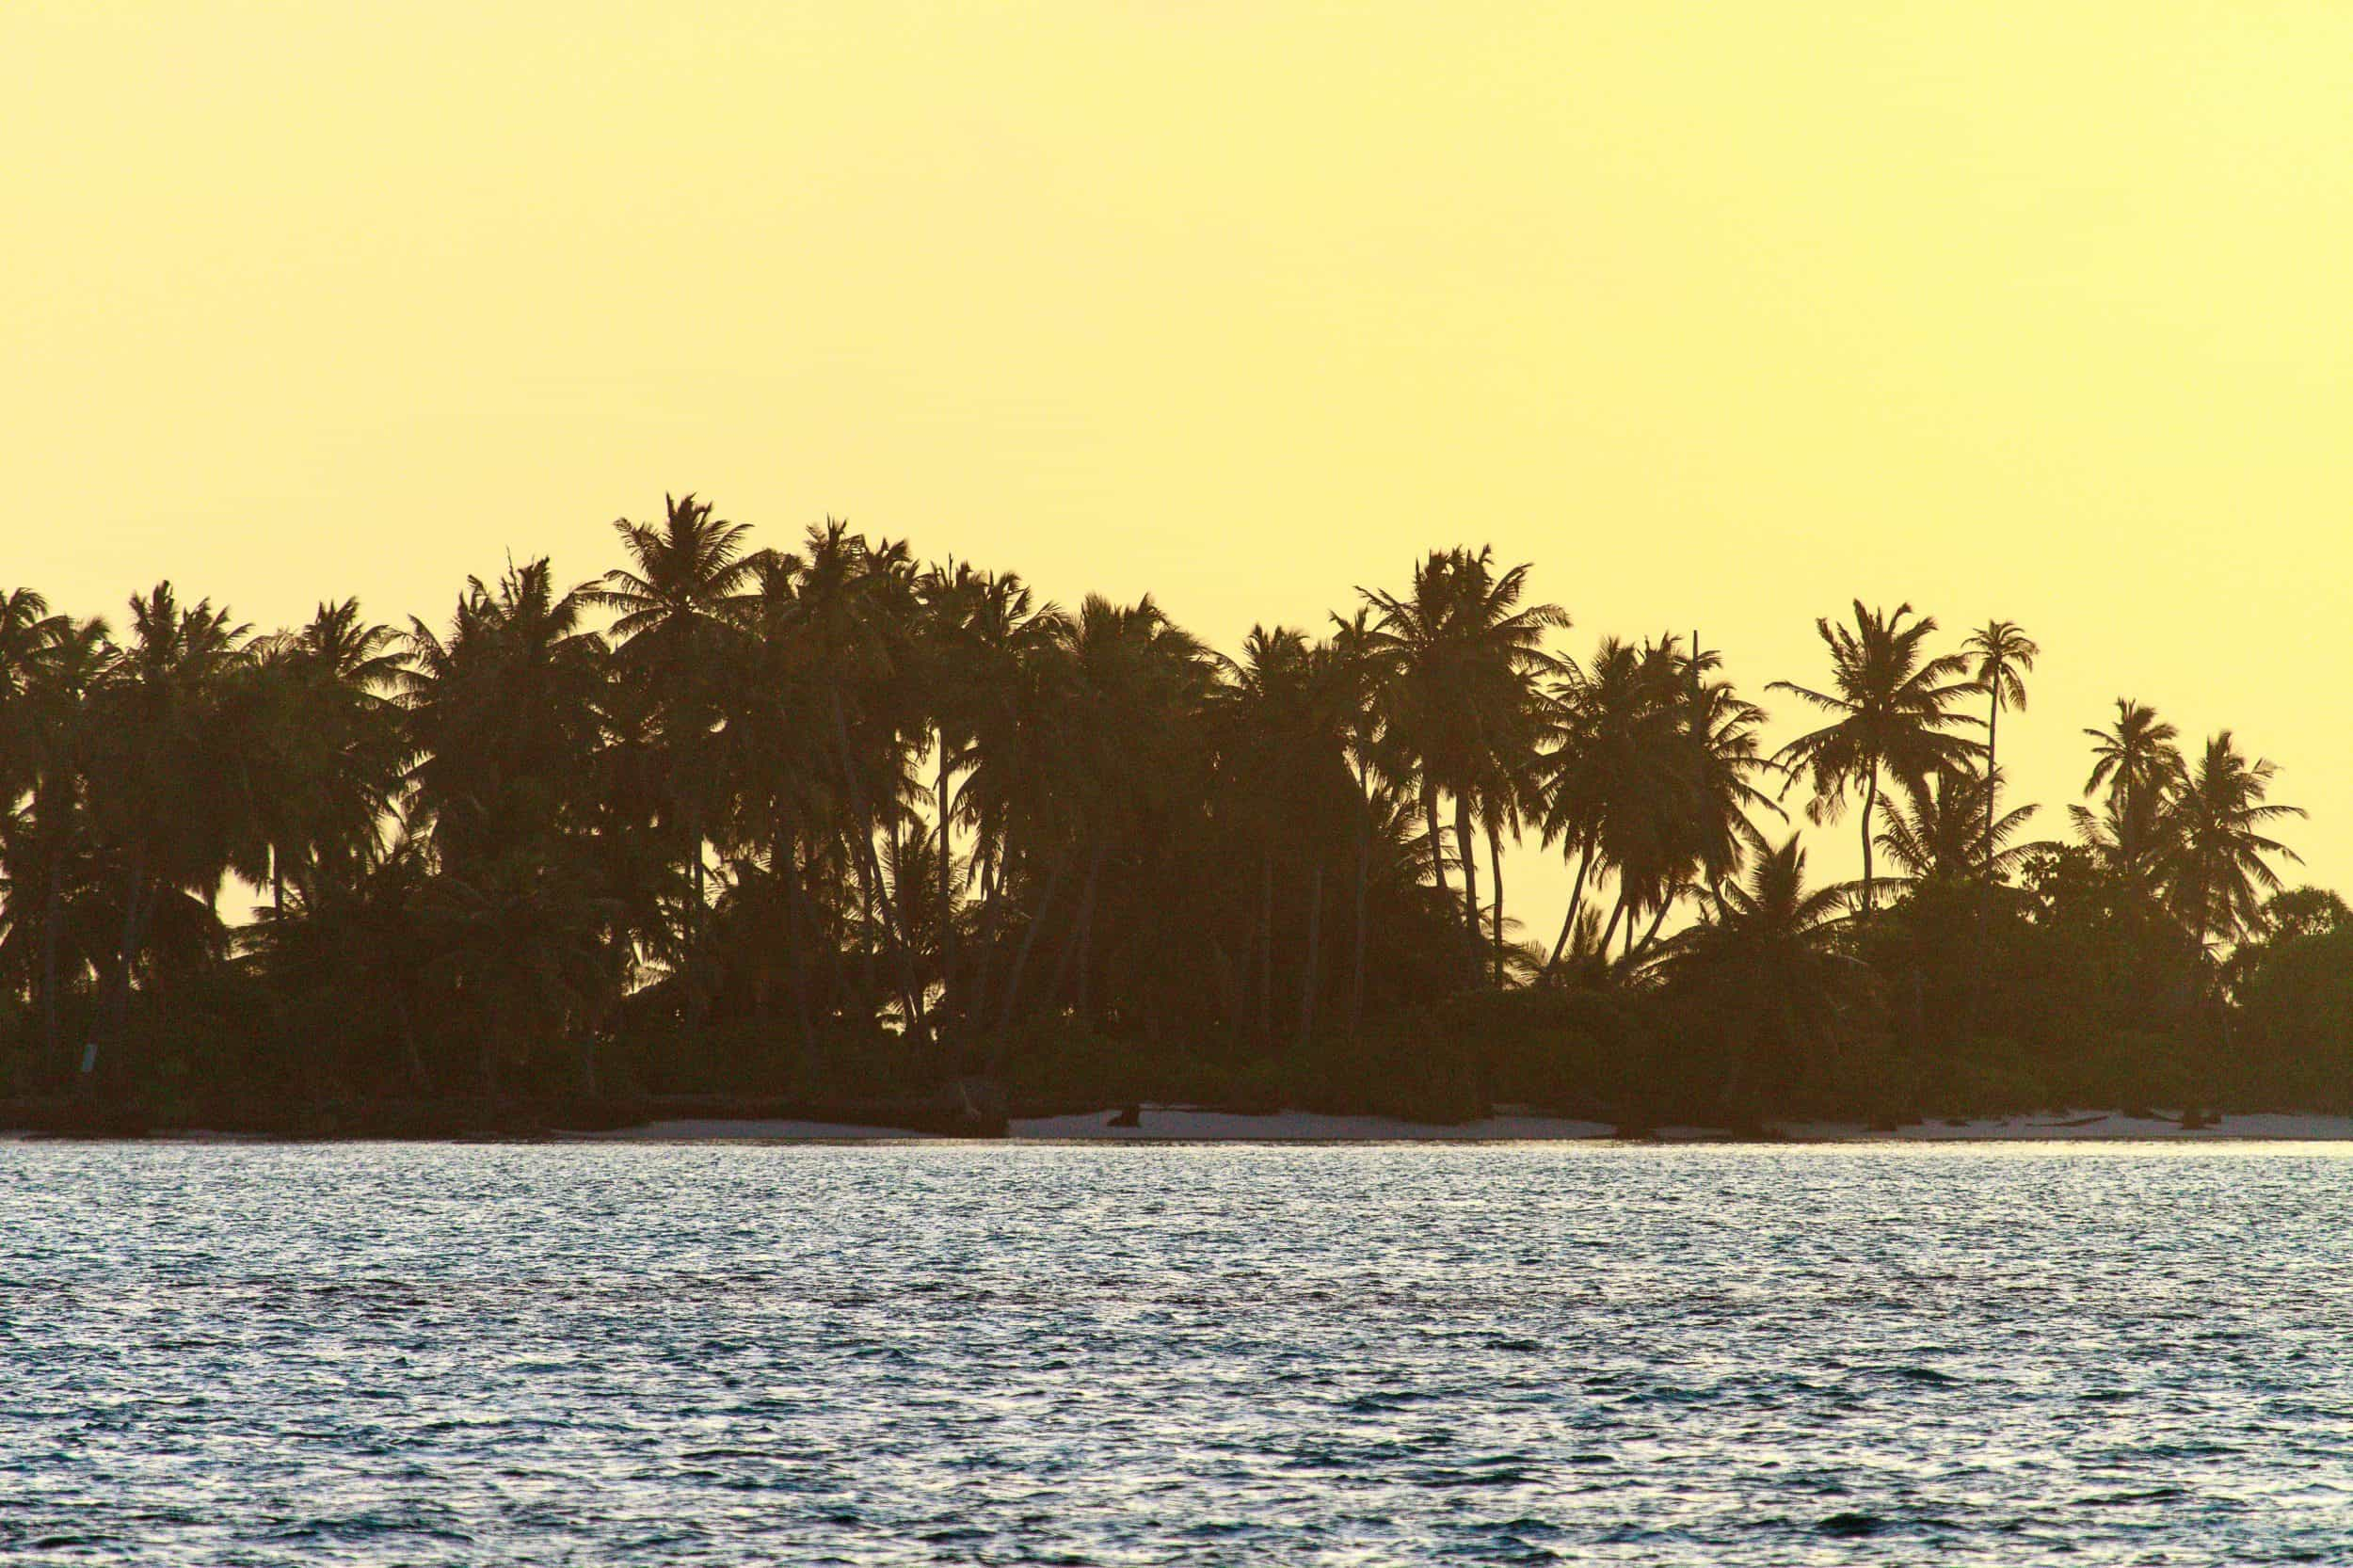 Surf båttur i Maldivene – Surf, spis, hvil, repeat.